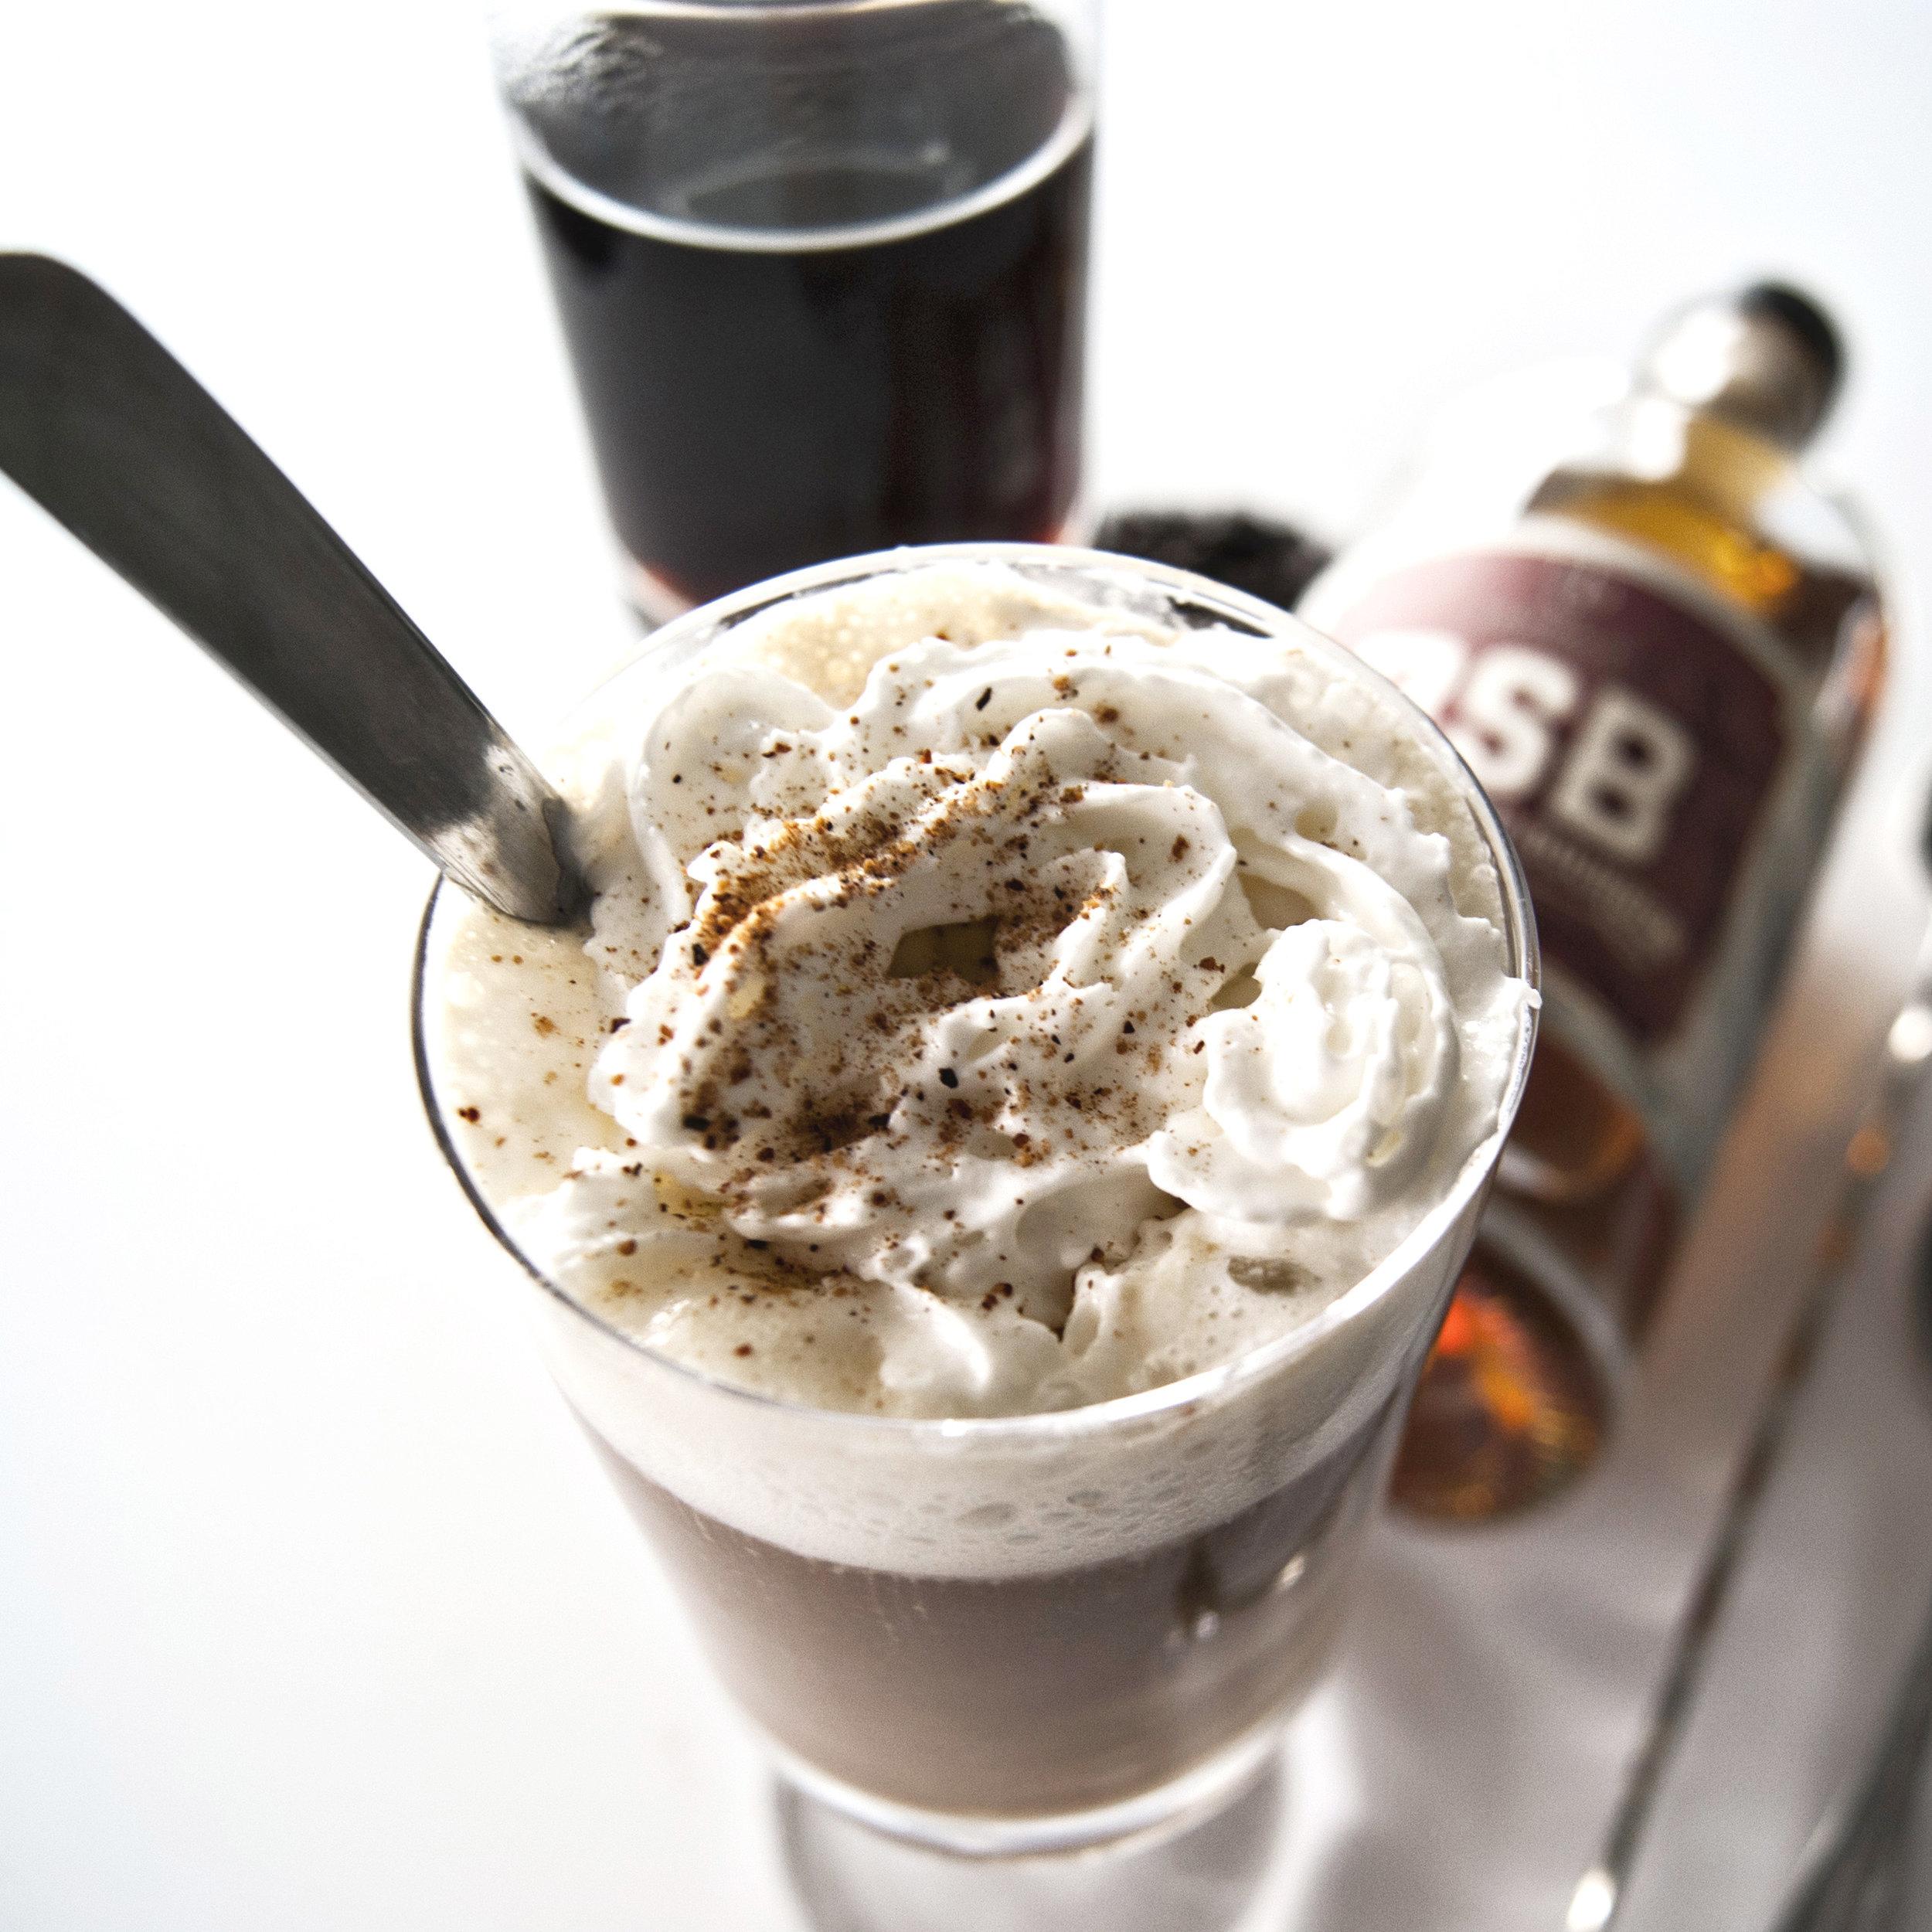 Yum with Sprinkles - Recipe: A cup of freshly brewed dark coffee, 1- 2 oz of B2B (Brown Sugar Bourbon), whip cream. Sprinkle your favorite garnish on top!